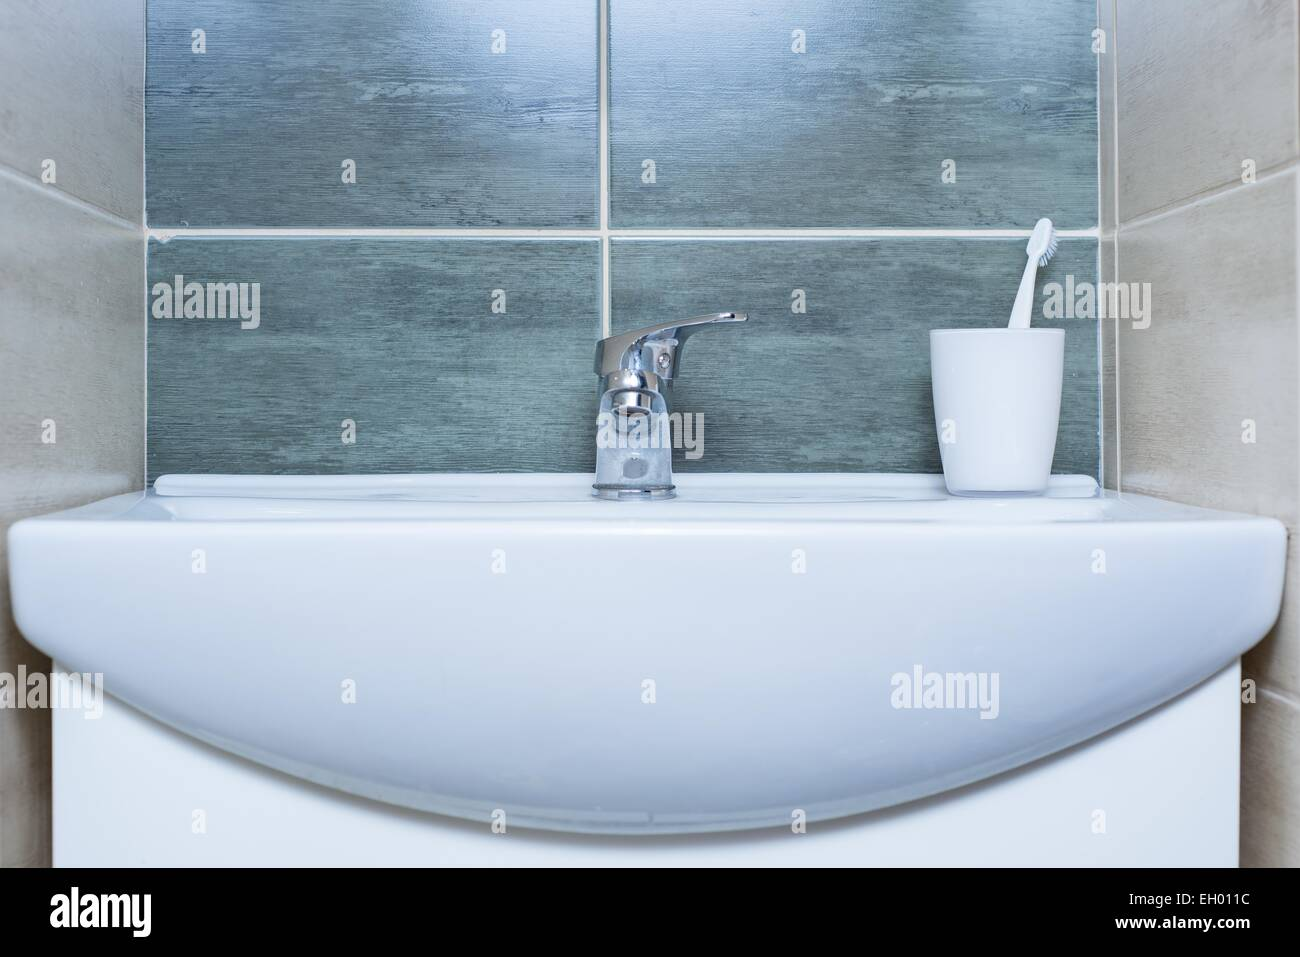 Ceramic Sink Stock Photos & Ceramic Sink Stock Images - Alamy